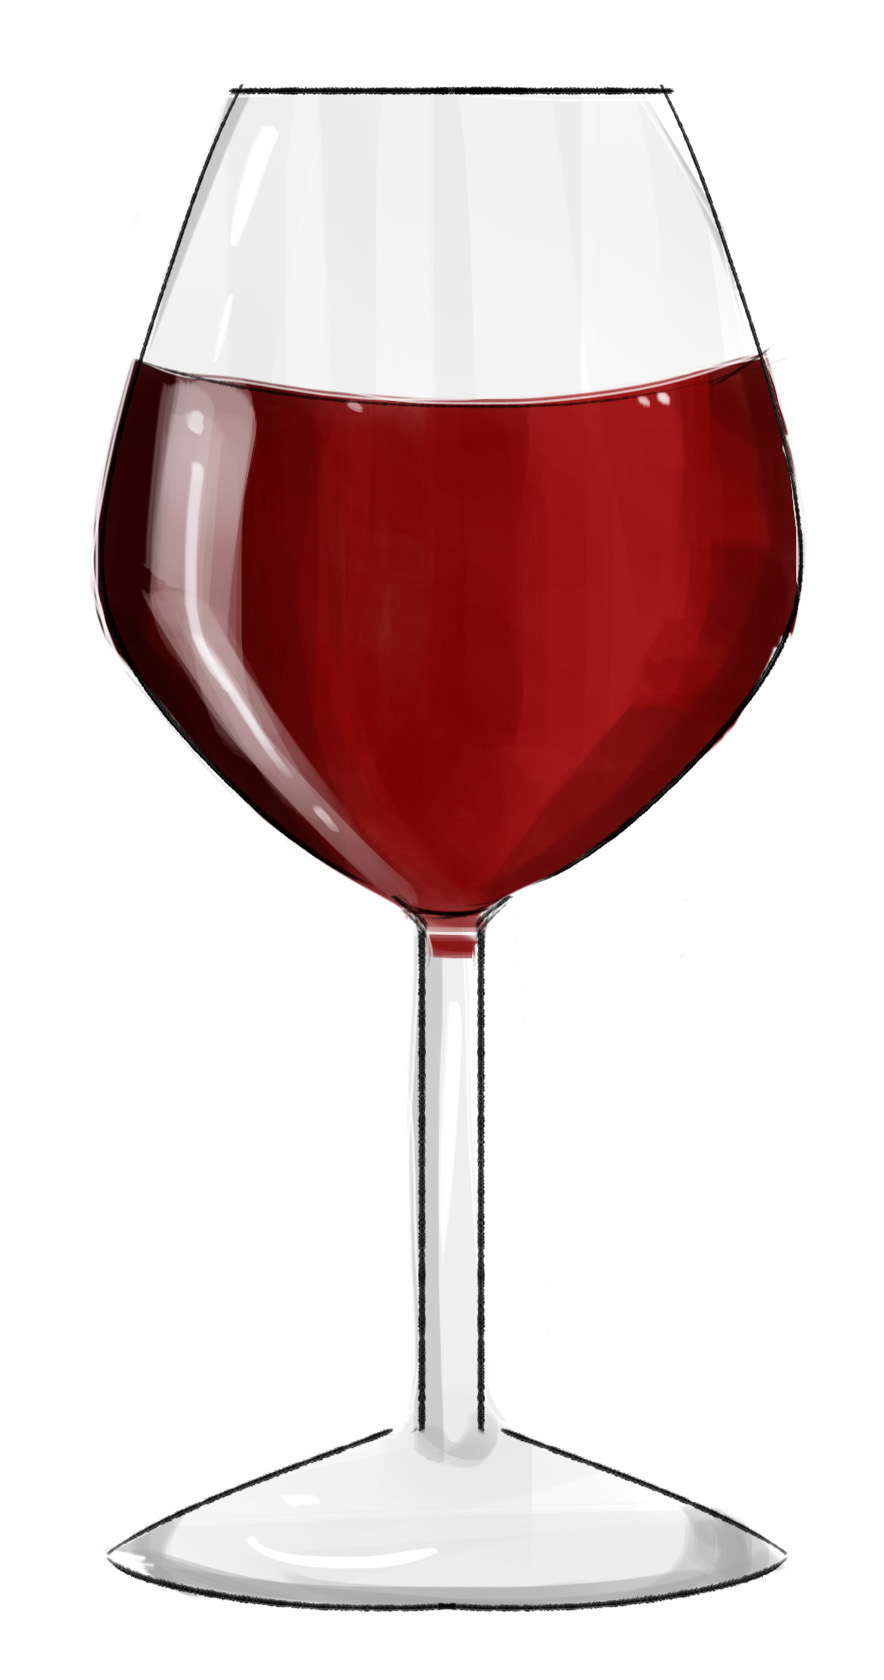 Red wine - antioxidants